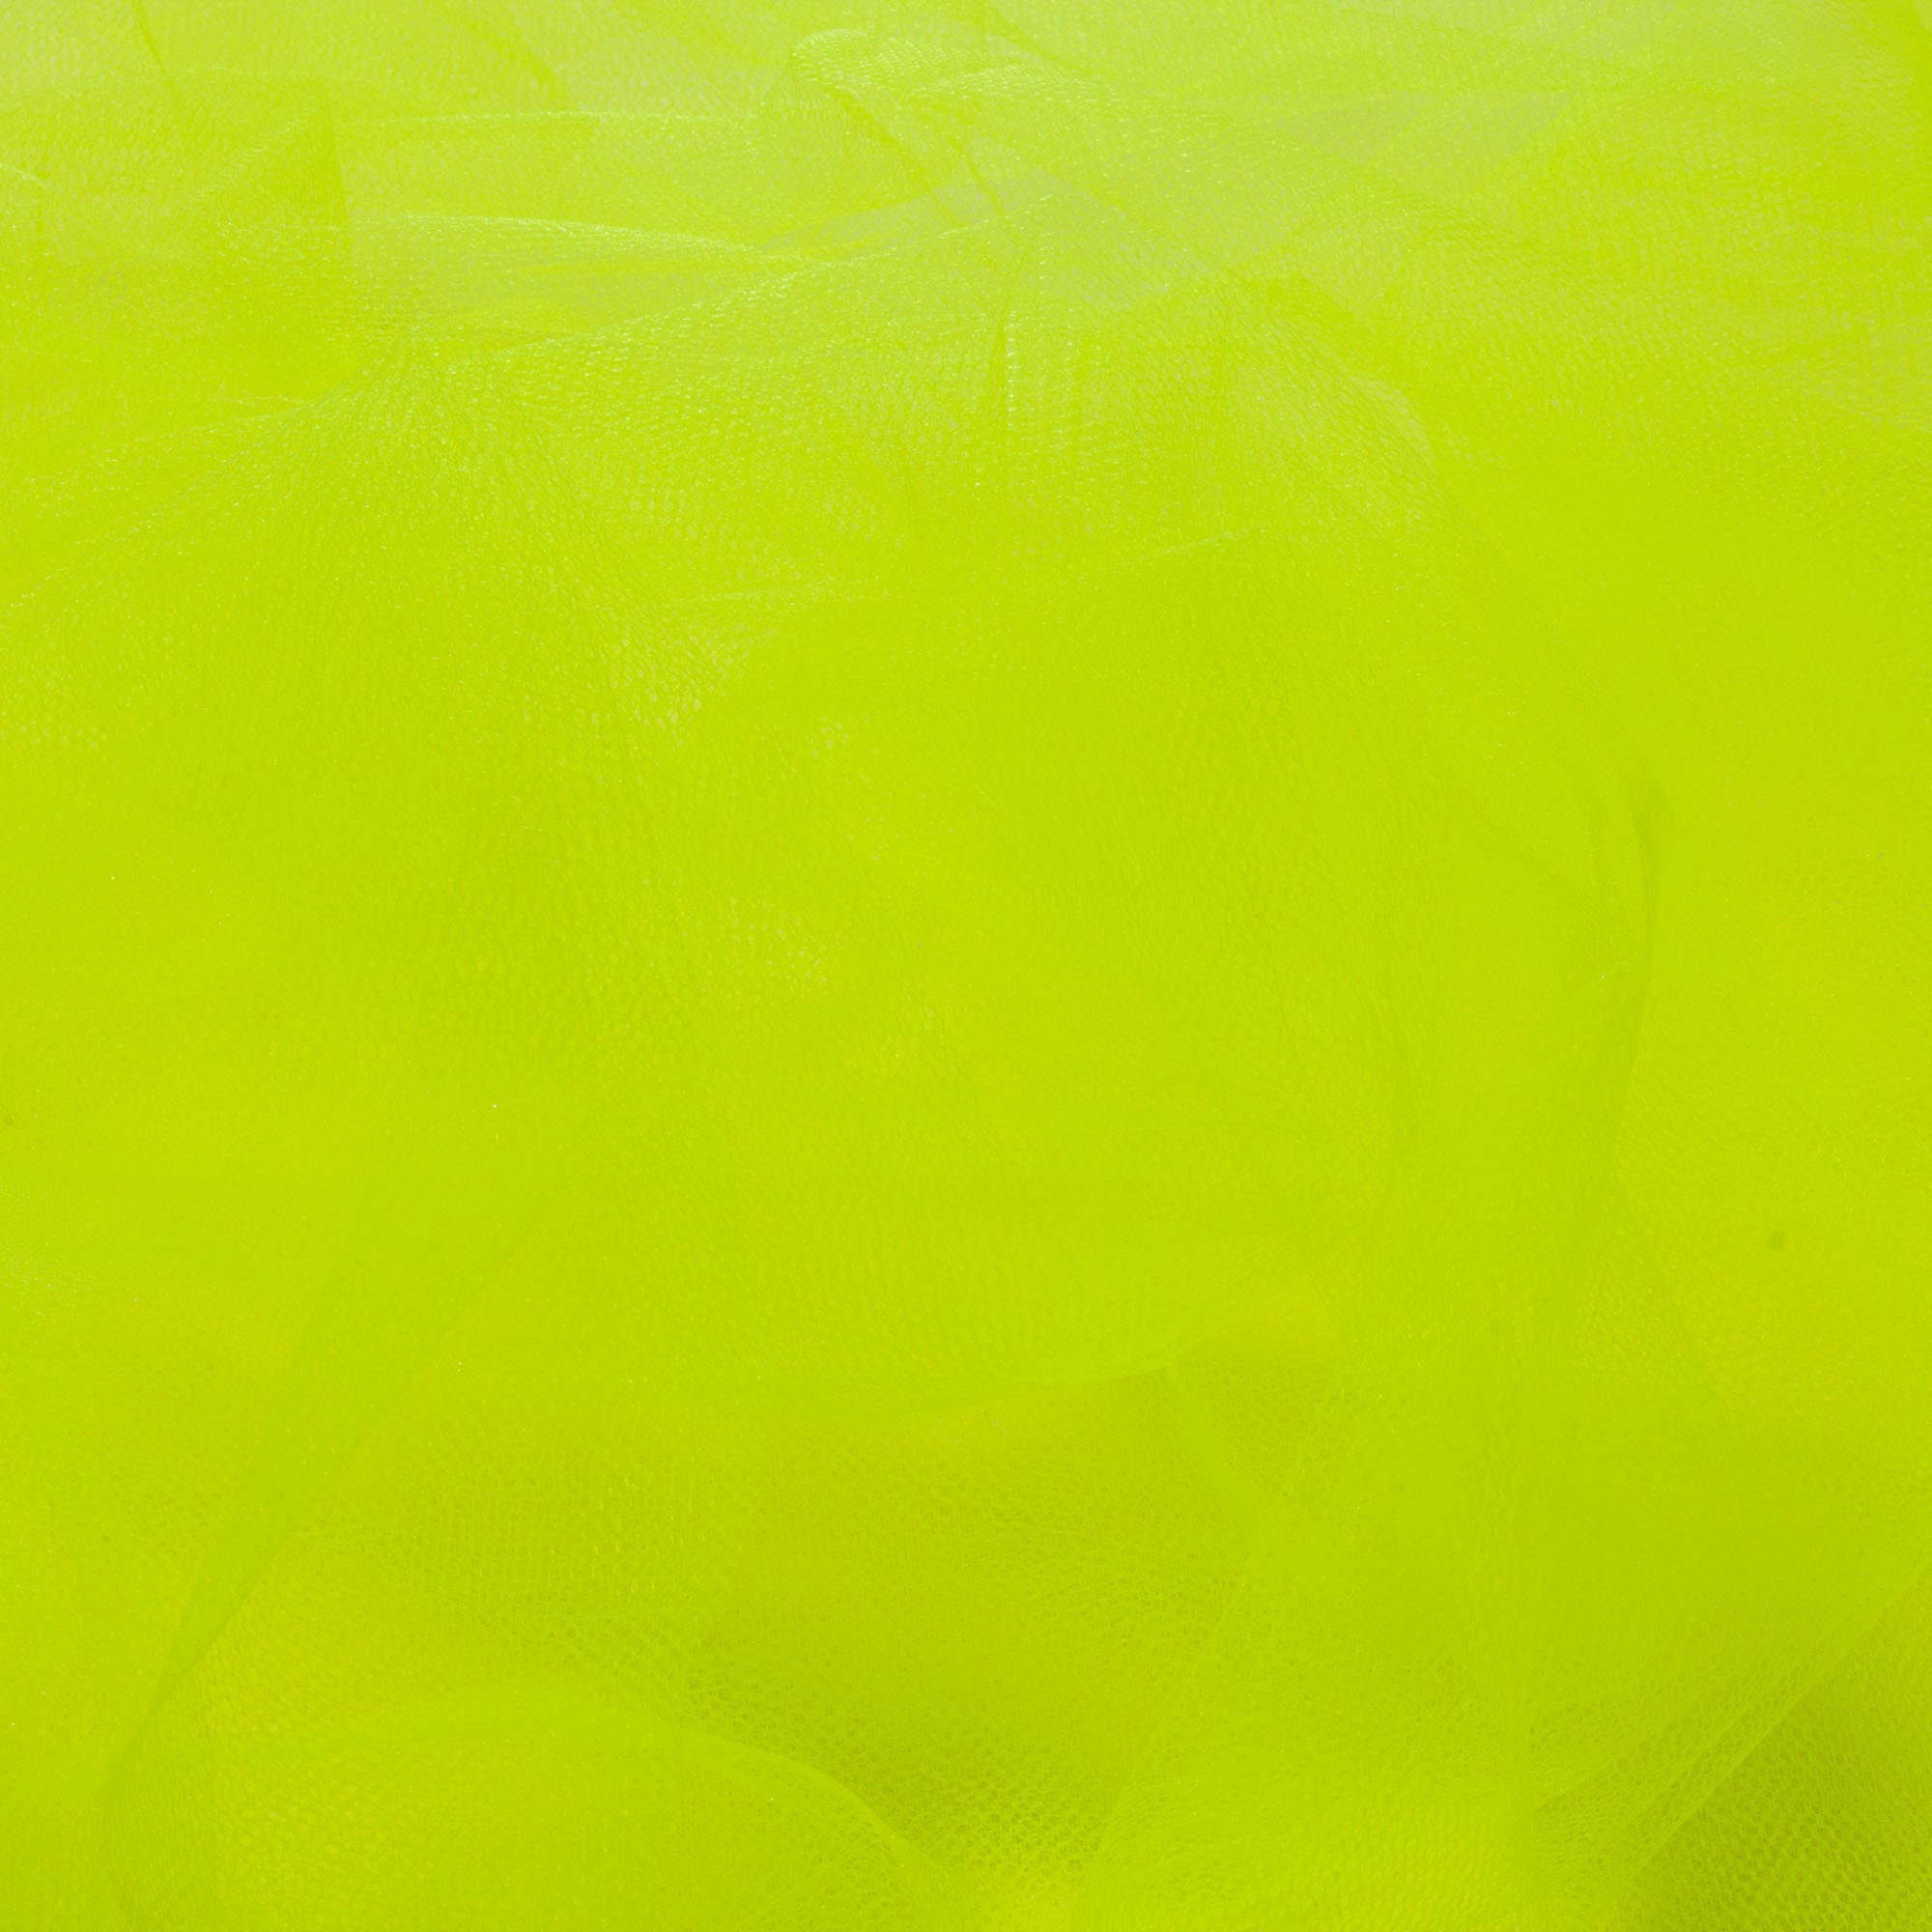 Rolo de Tecido Tule 50 Metros 1,20 Mt Largura Amarelo Limão